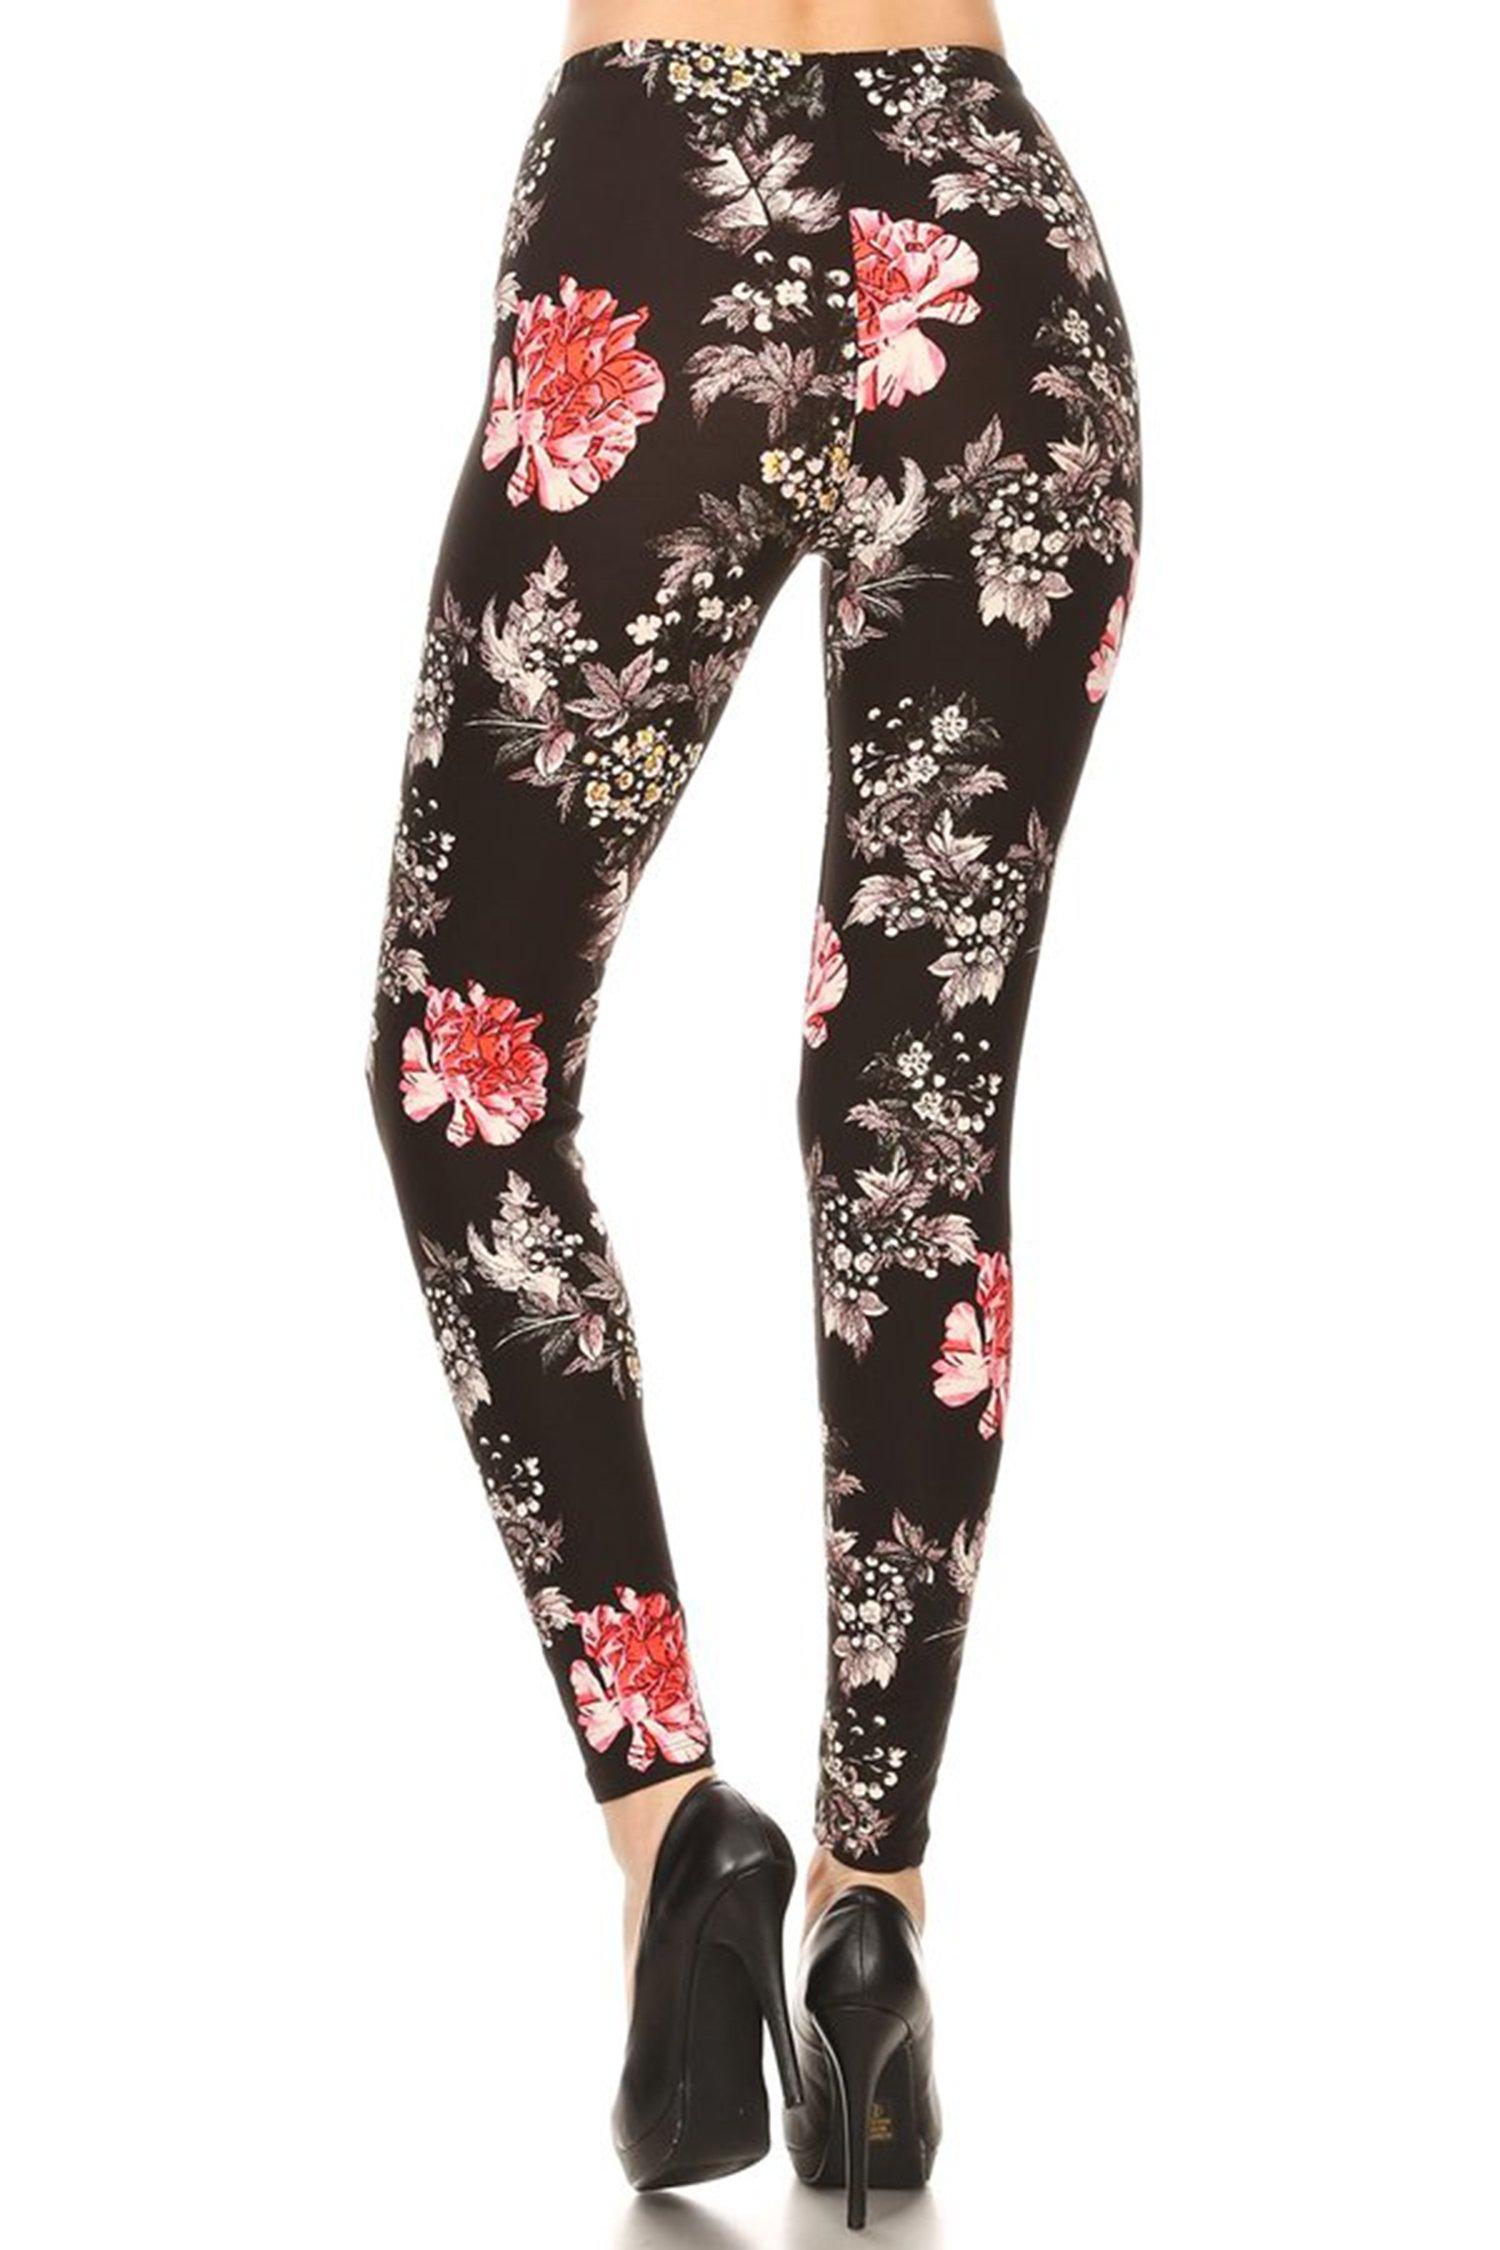 Leggings Mania Women's Plus Floral Print High Waist Leggings Black Multi, Plus One Size Fits Most (12-22), Floral by Leggings Mania (Image #3)